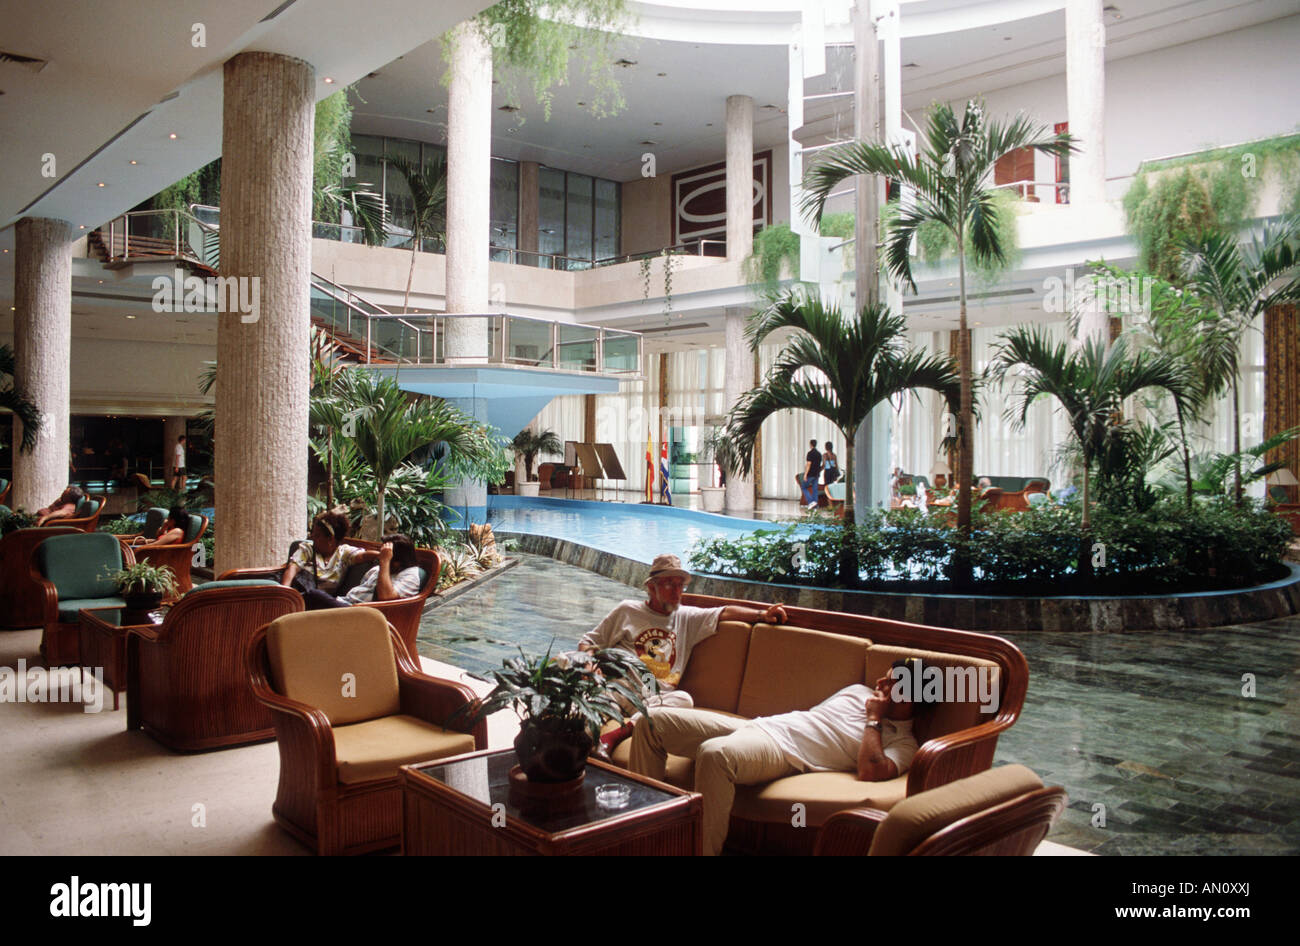 Interieur des Hotels Havanna Libre Tryp, Kuba Stockfoto, Bild ...